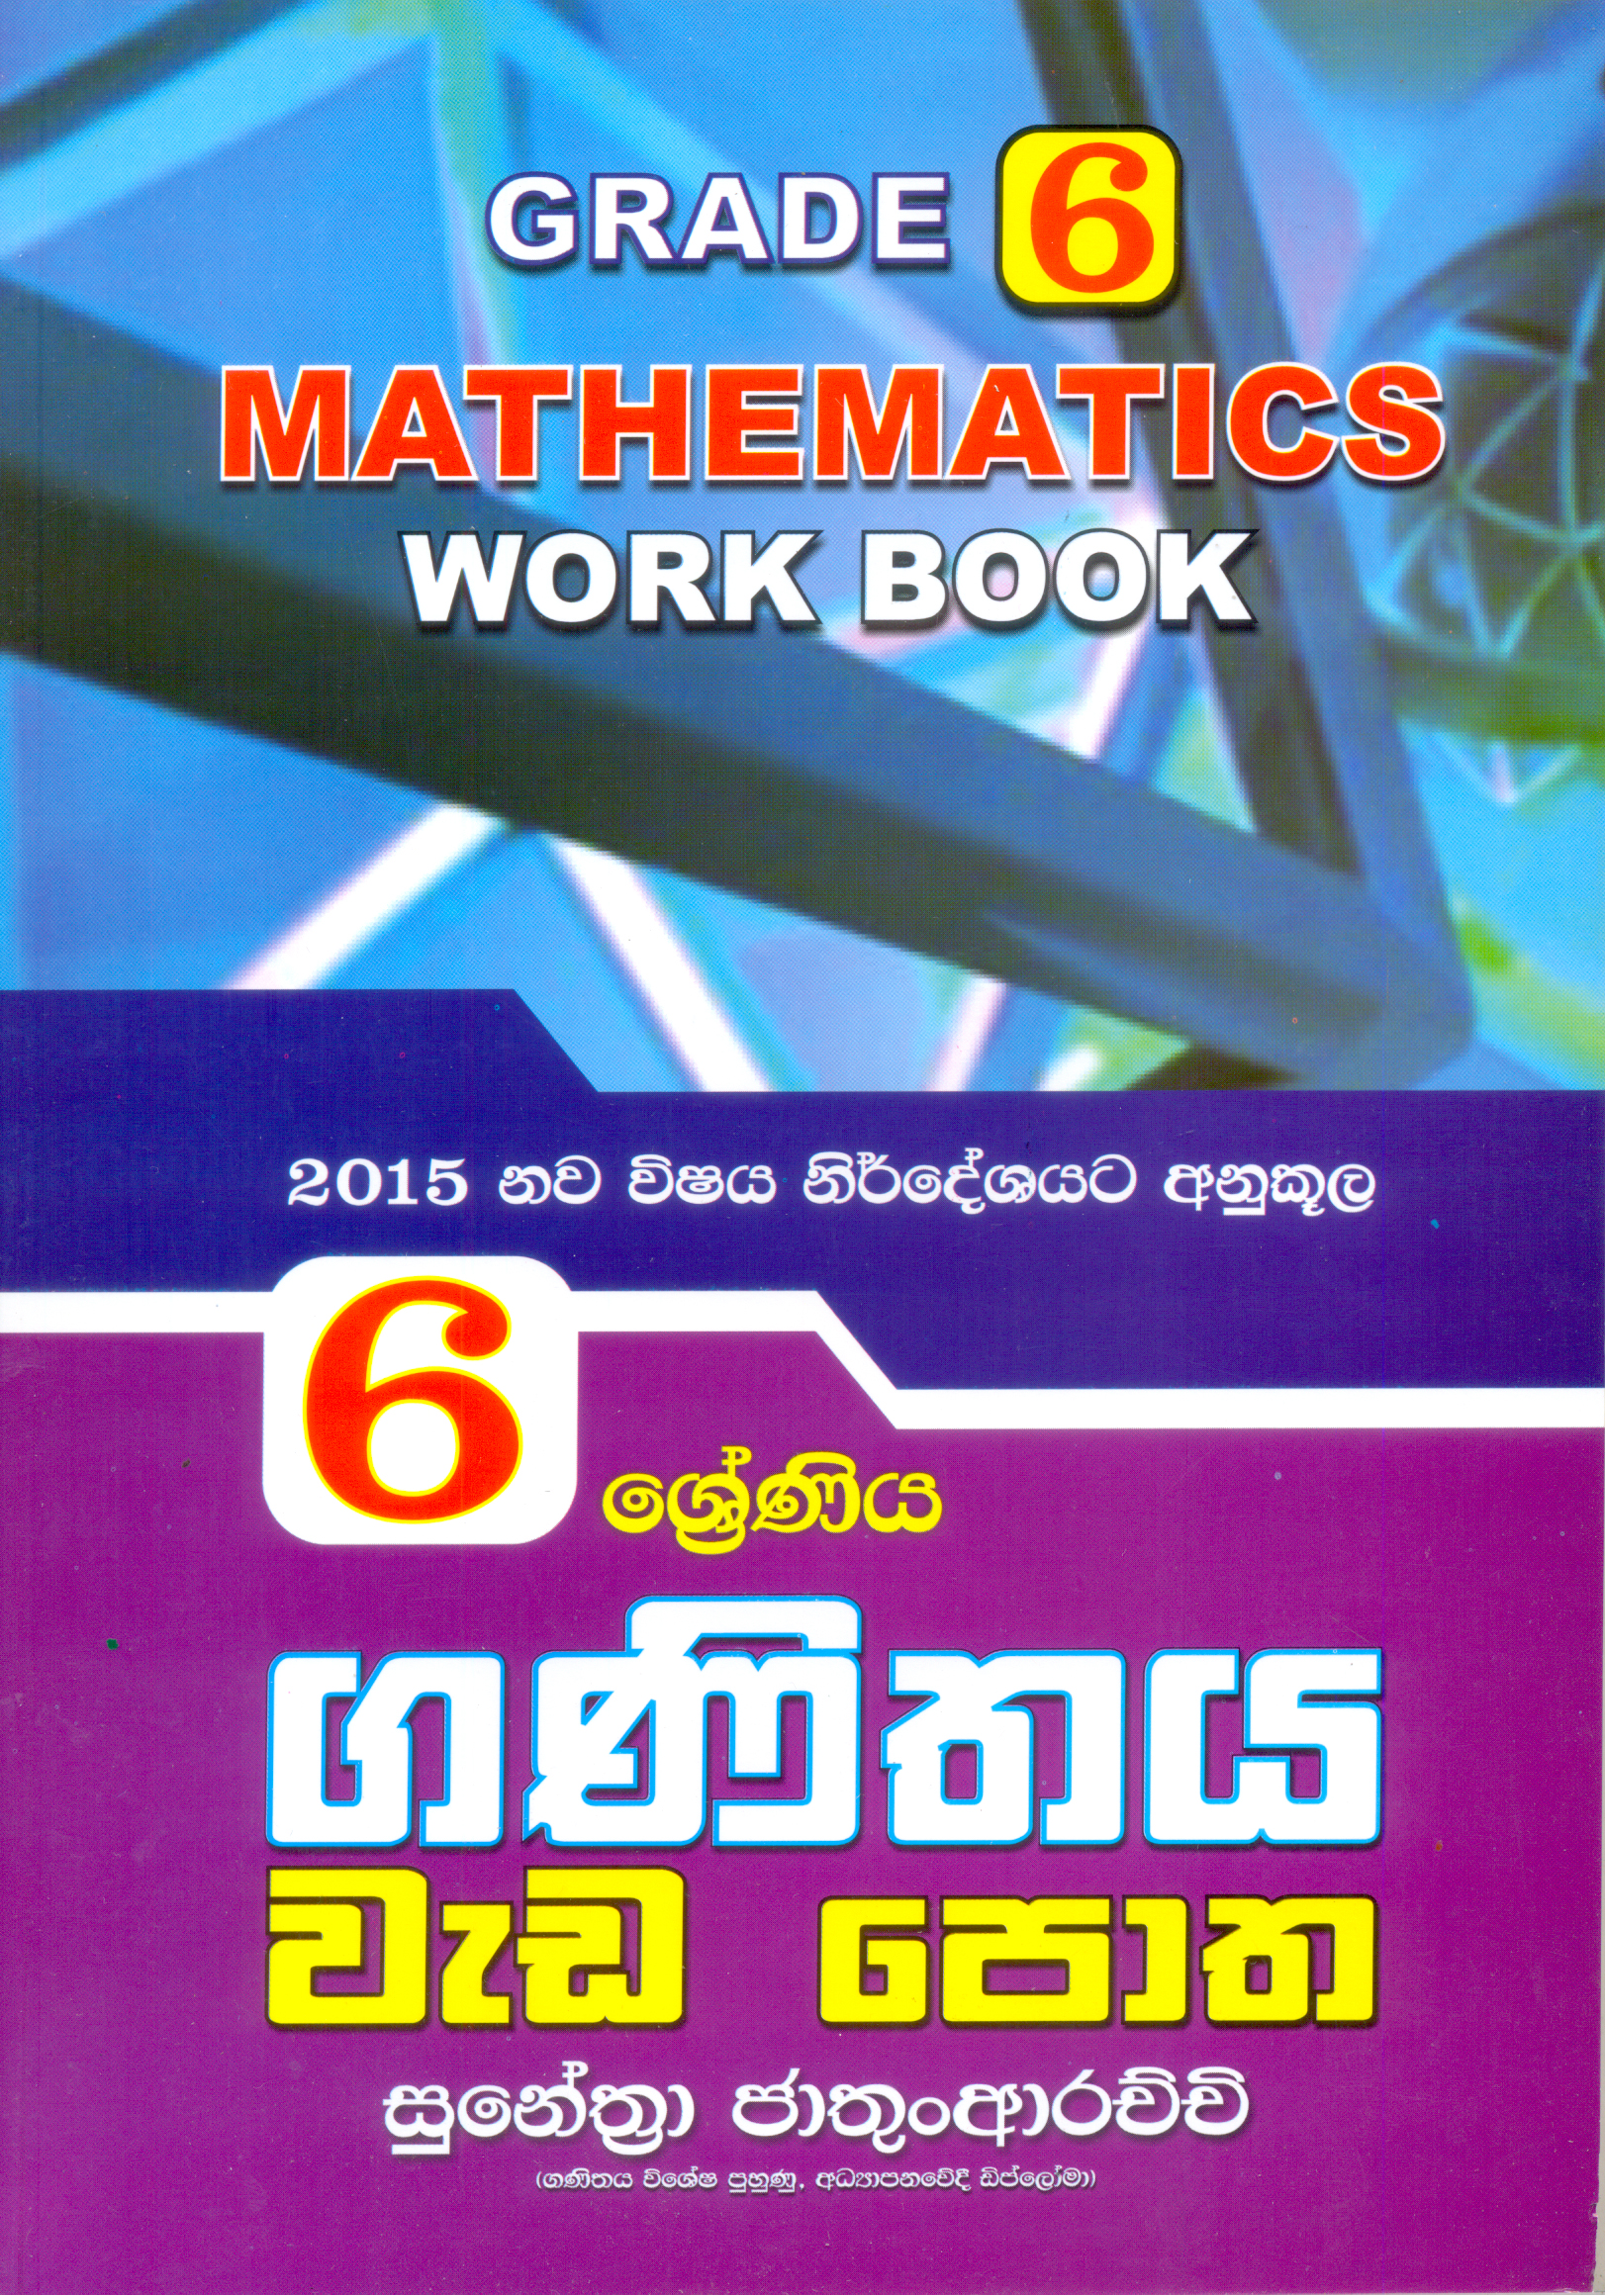 6 Shreniya Ganithaya Wada Potha